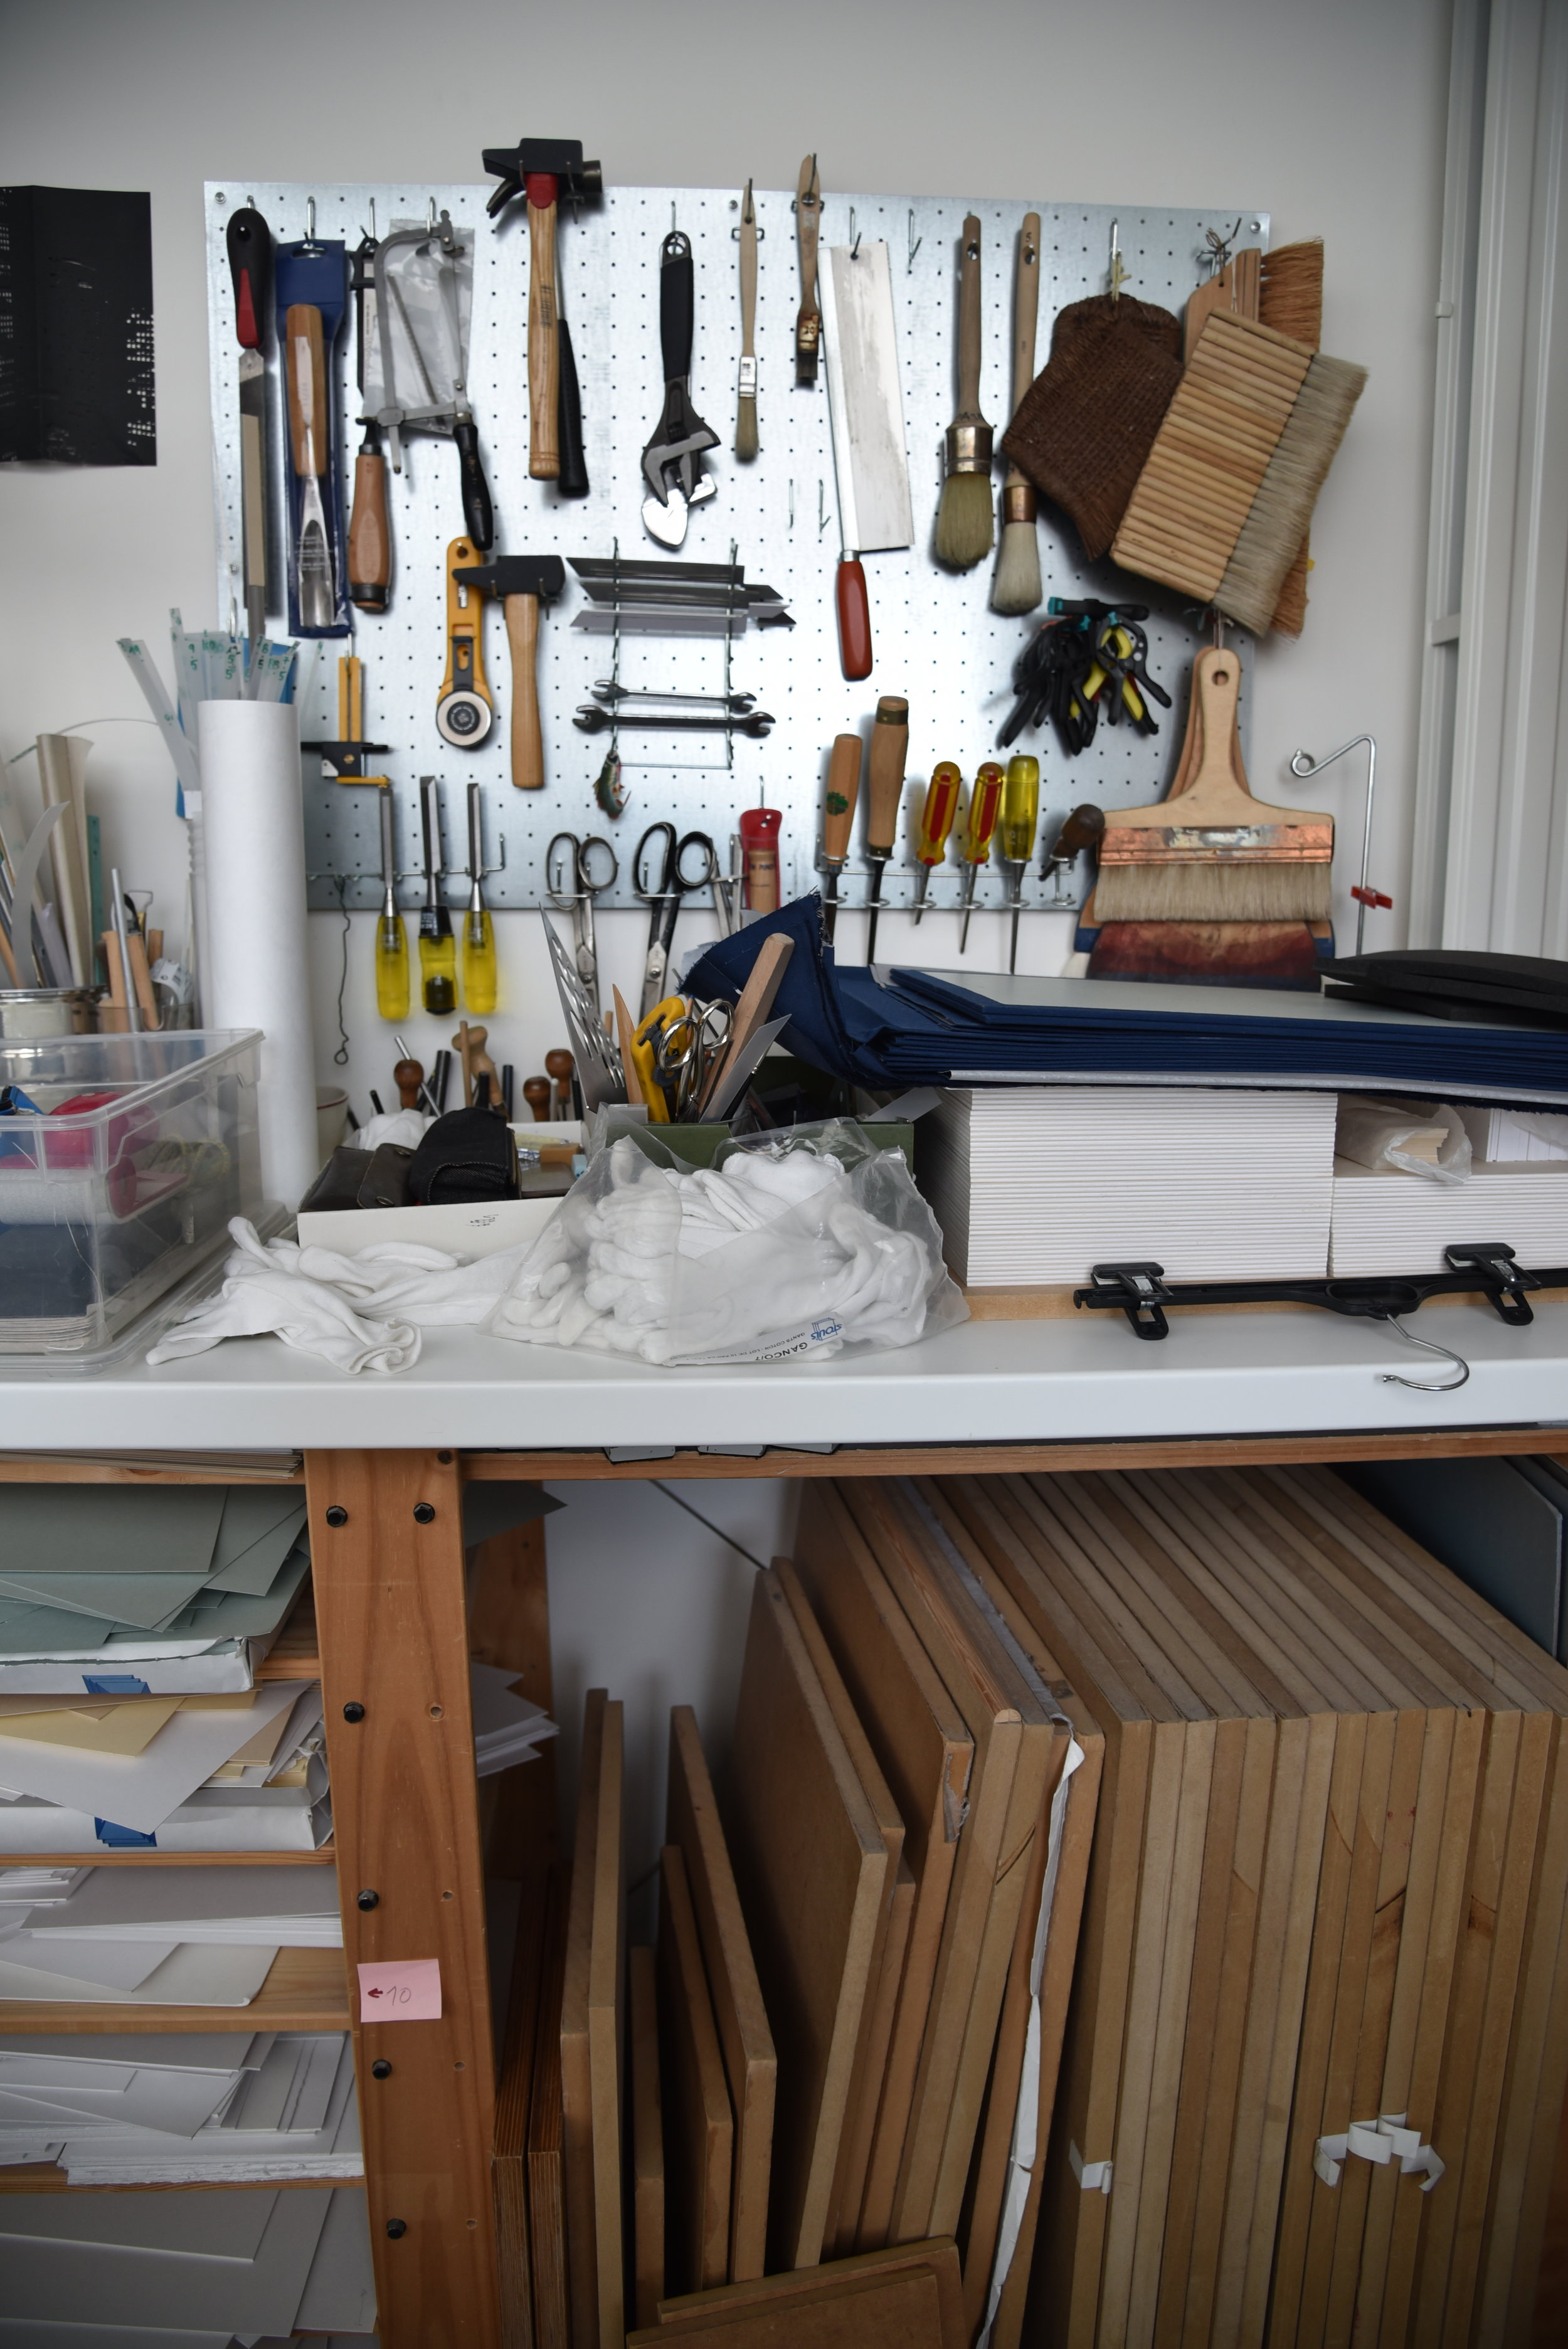 Laurel Parker bookbinding studio